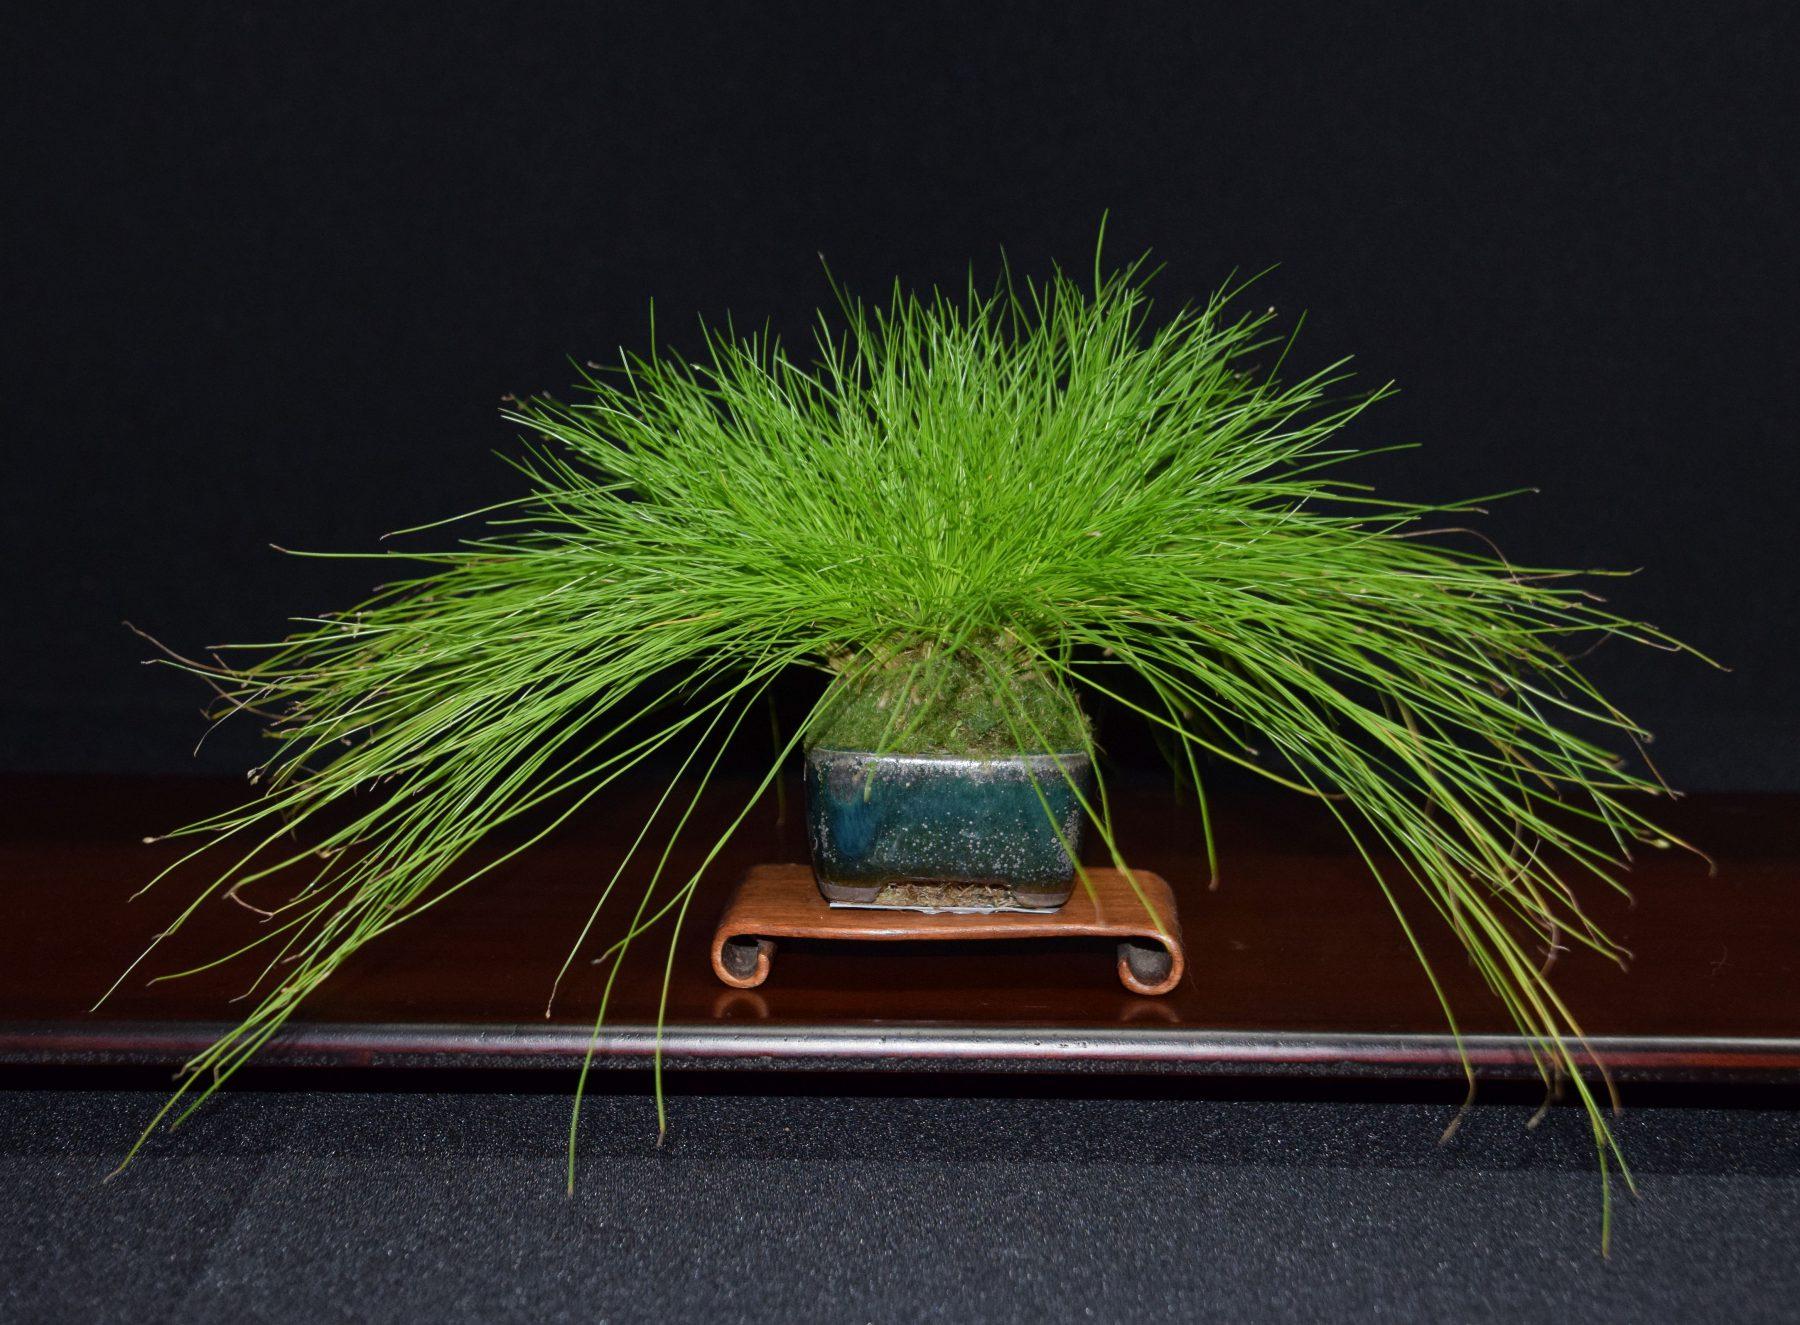 bonsai-museum-luis-vallejo-037